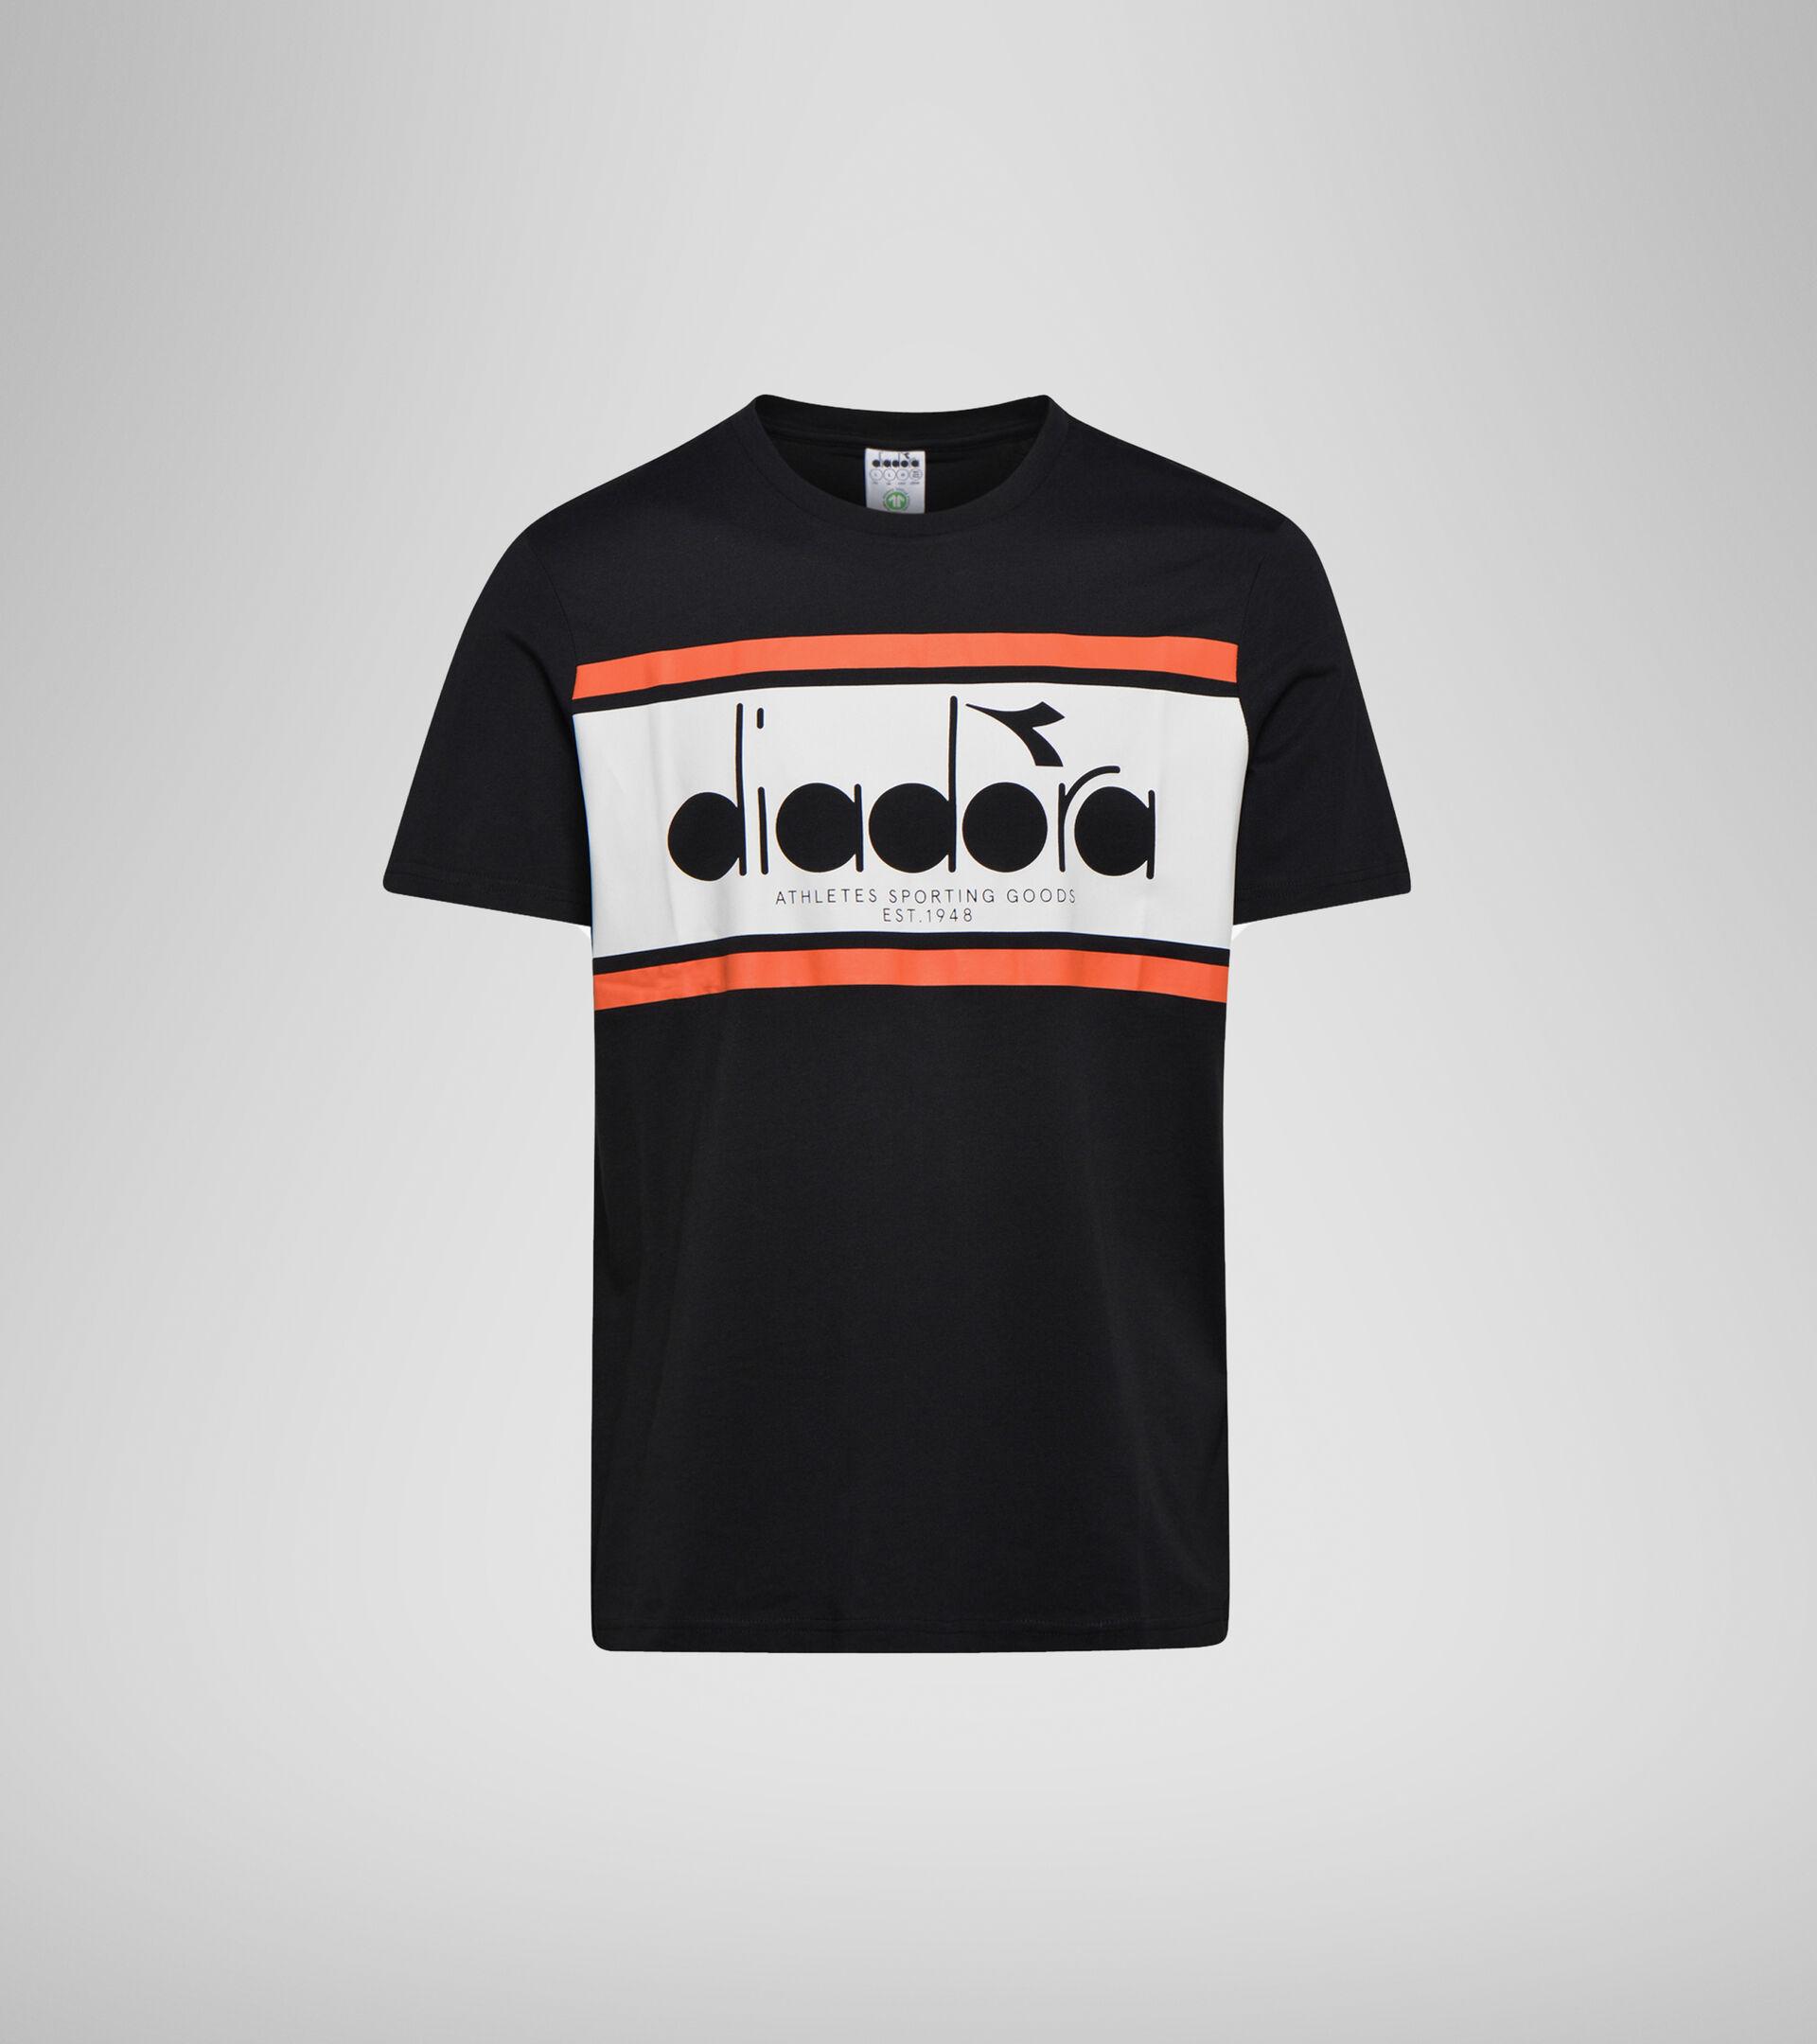 Apparel Sportswear UOMO SS T-SHIRT SPECTRA OC NERO/BIANCO LATTE/ARANCIATA Diadora